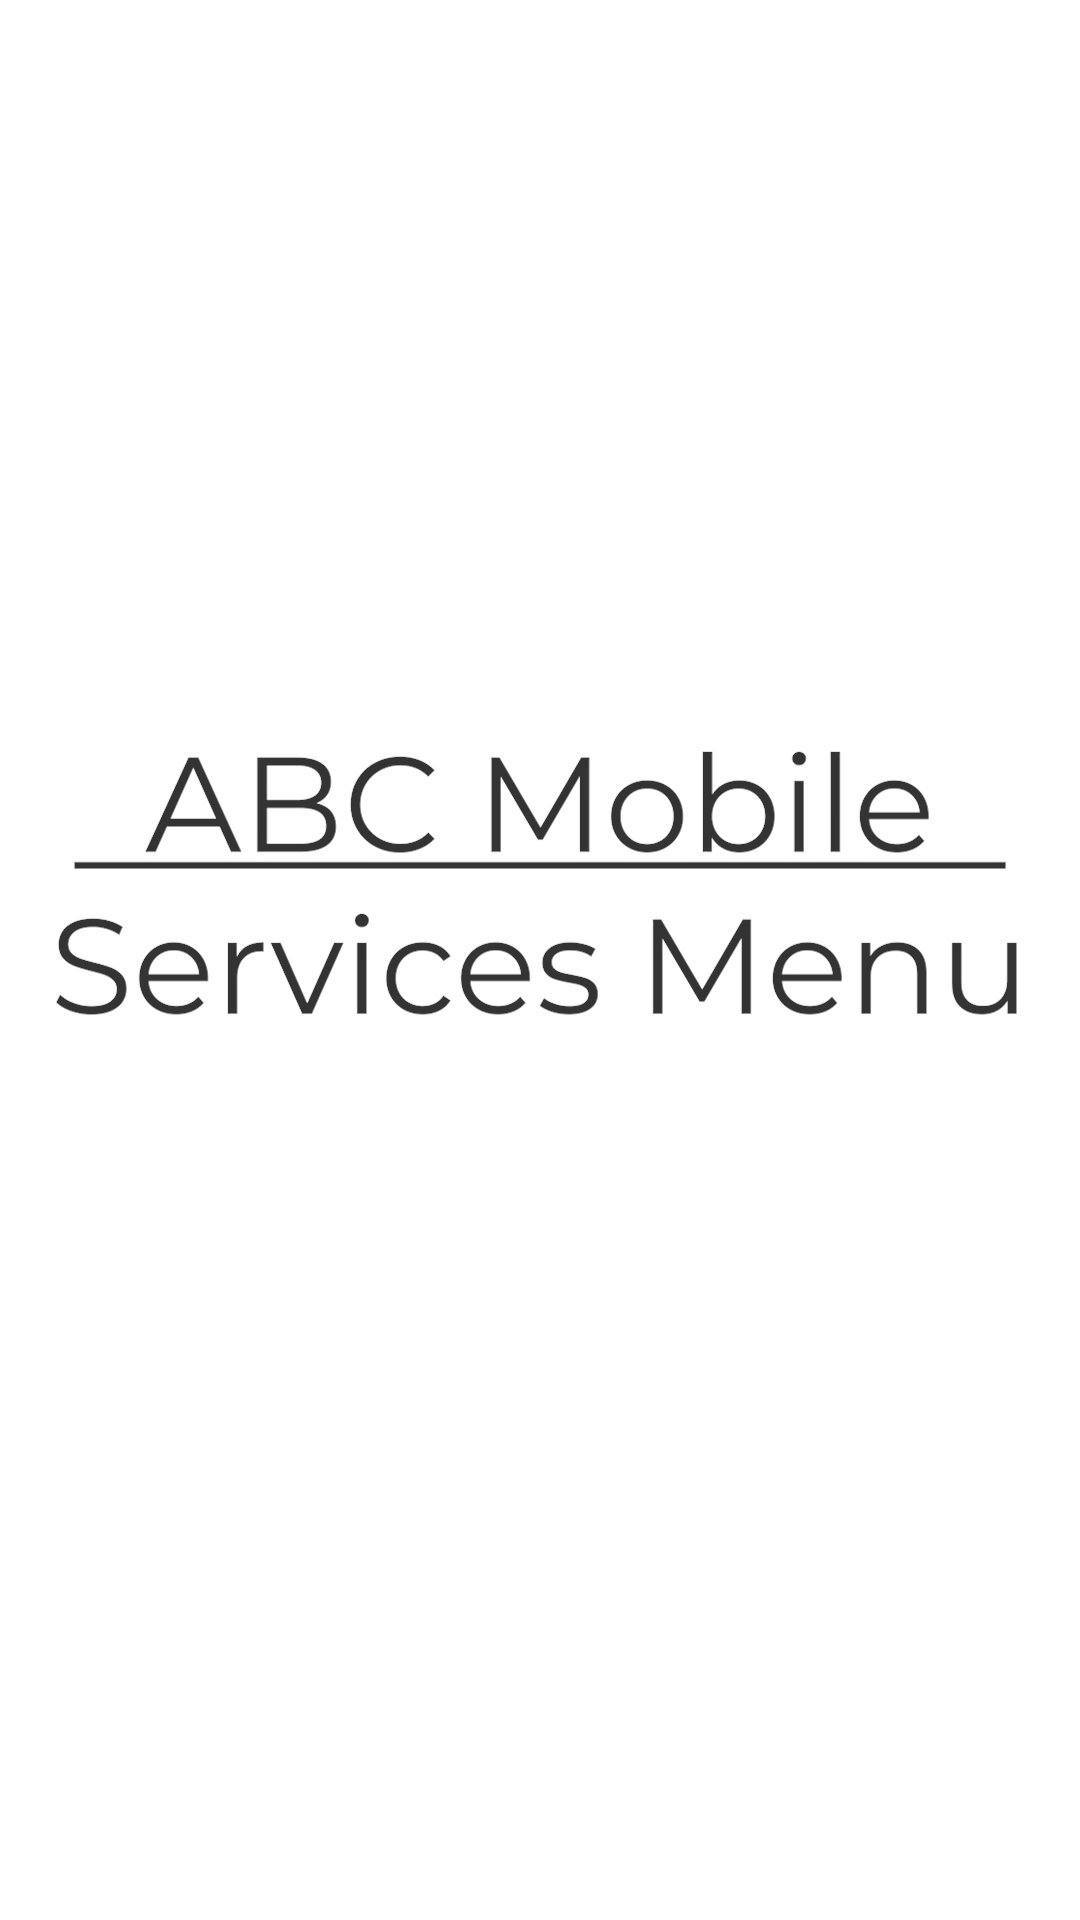 3 Services Menu